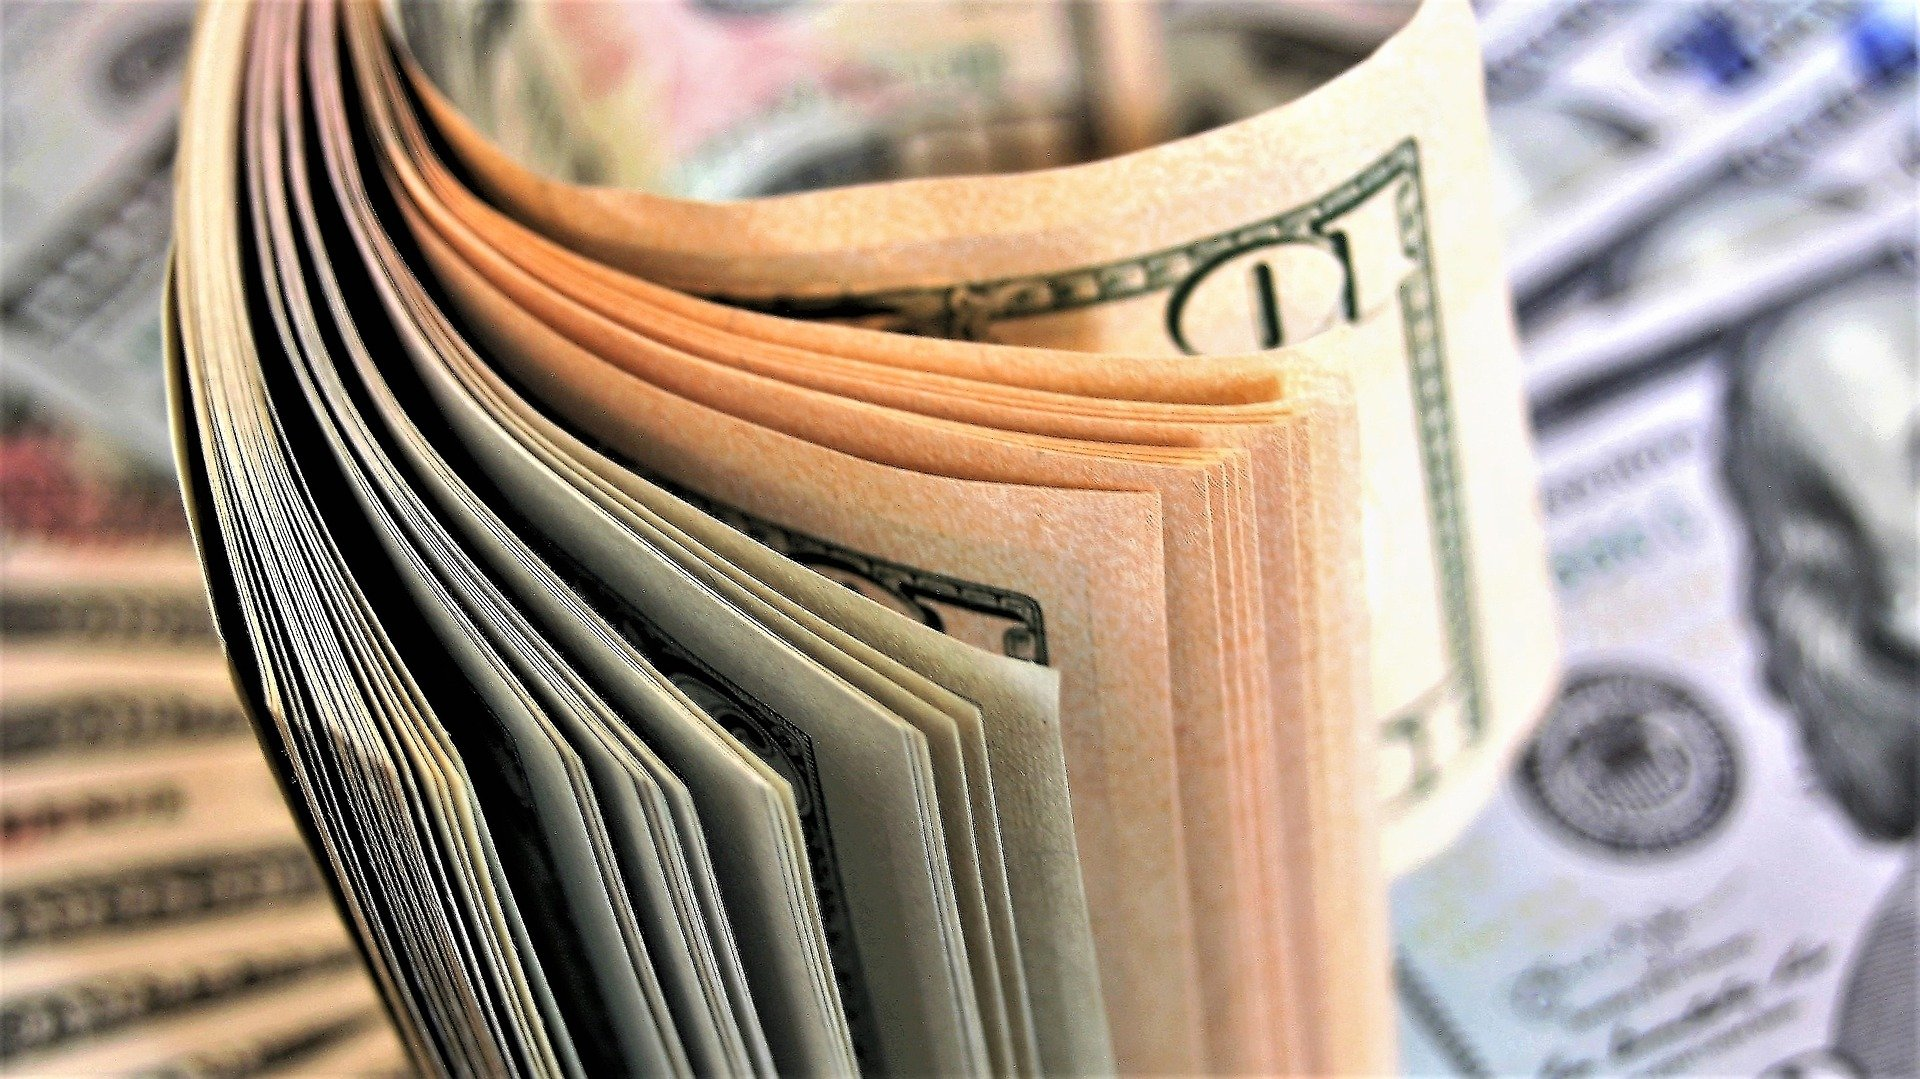 Kur likt vecu, bojātu vai viltotu naudu? | SEB banka